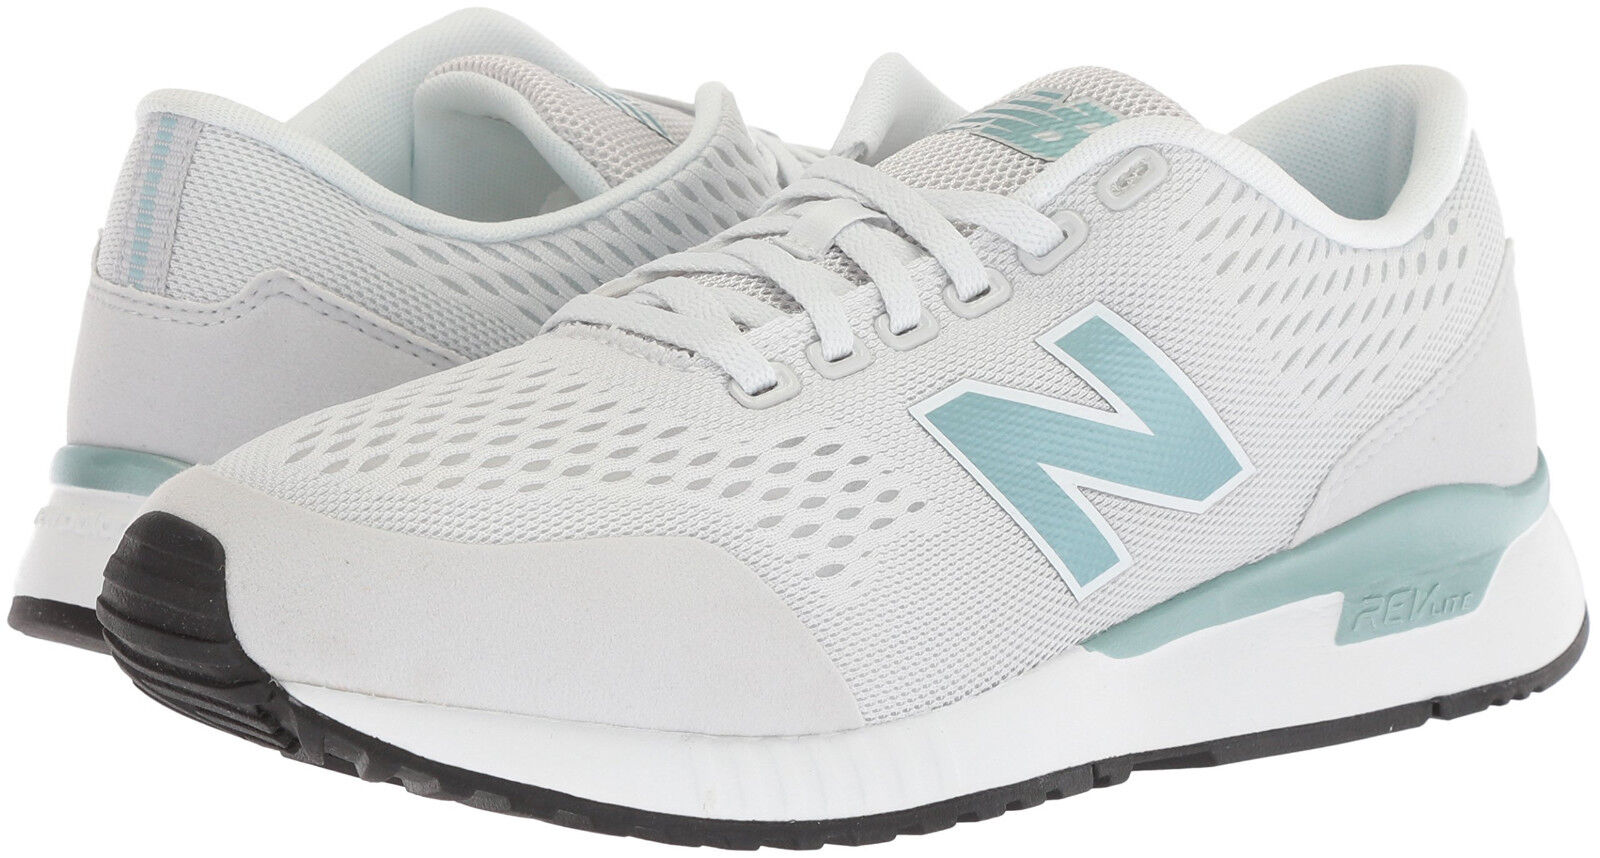 Damens New Balance WL005PM Sneaker Schuhes Medium (B) Pale Grau 100% Original New